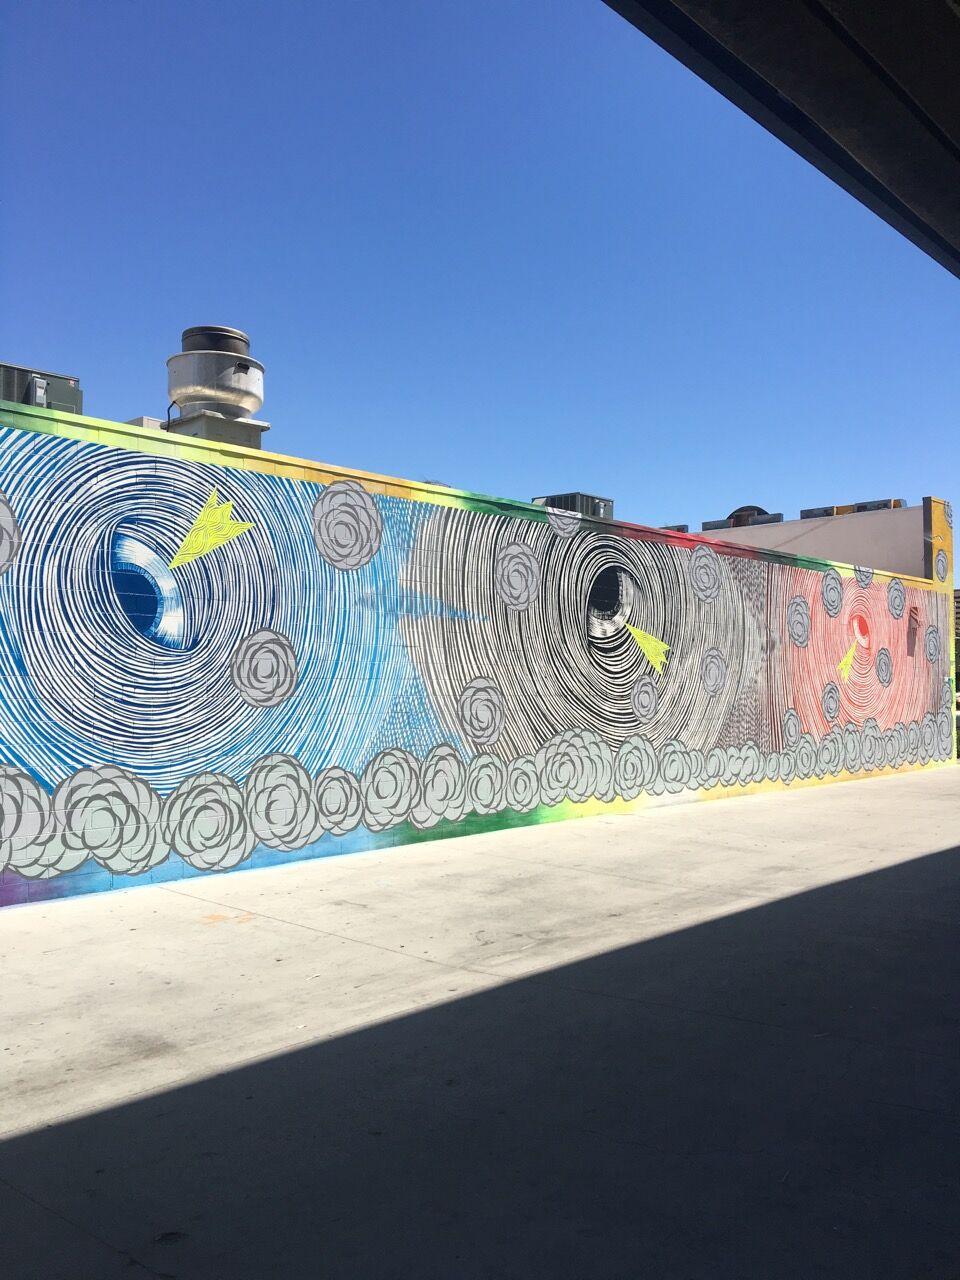 Optical Vortex (Spinning Eyes), 2016; Acrylic on wall; 12 x 30 x 6 feet; Courtesy of the artist and Hosfelt Gallery